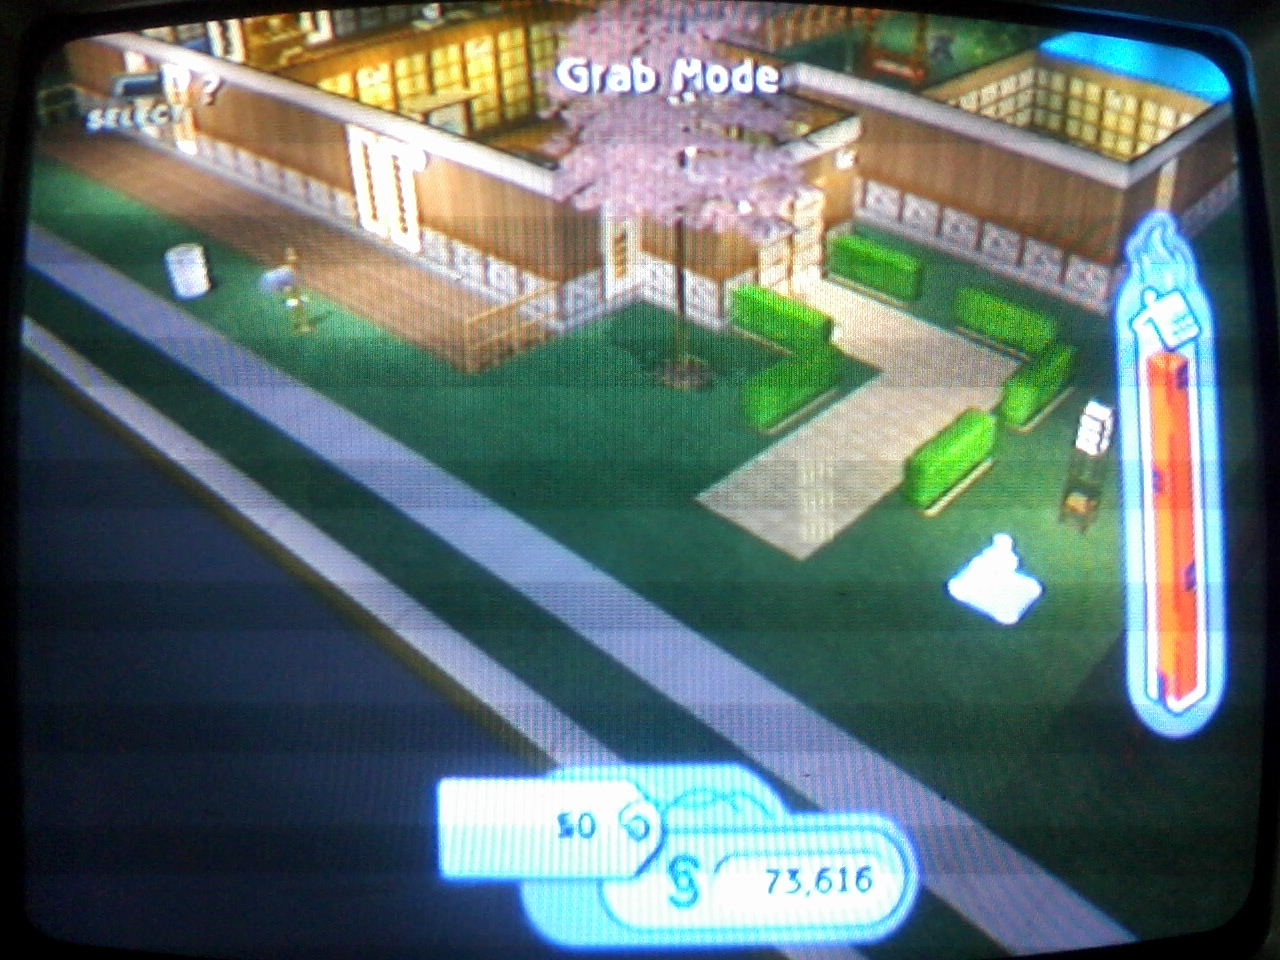 Desain rumah The sims 2 Ps #2 & ain rumah The sims 2 Ps #2~Liichiho Lia~: Des